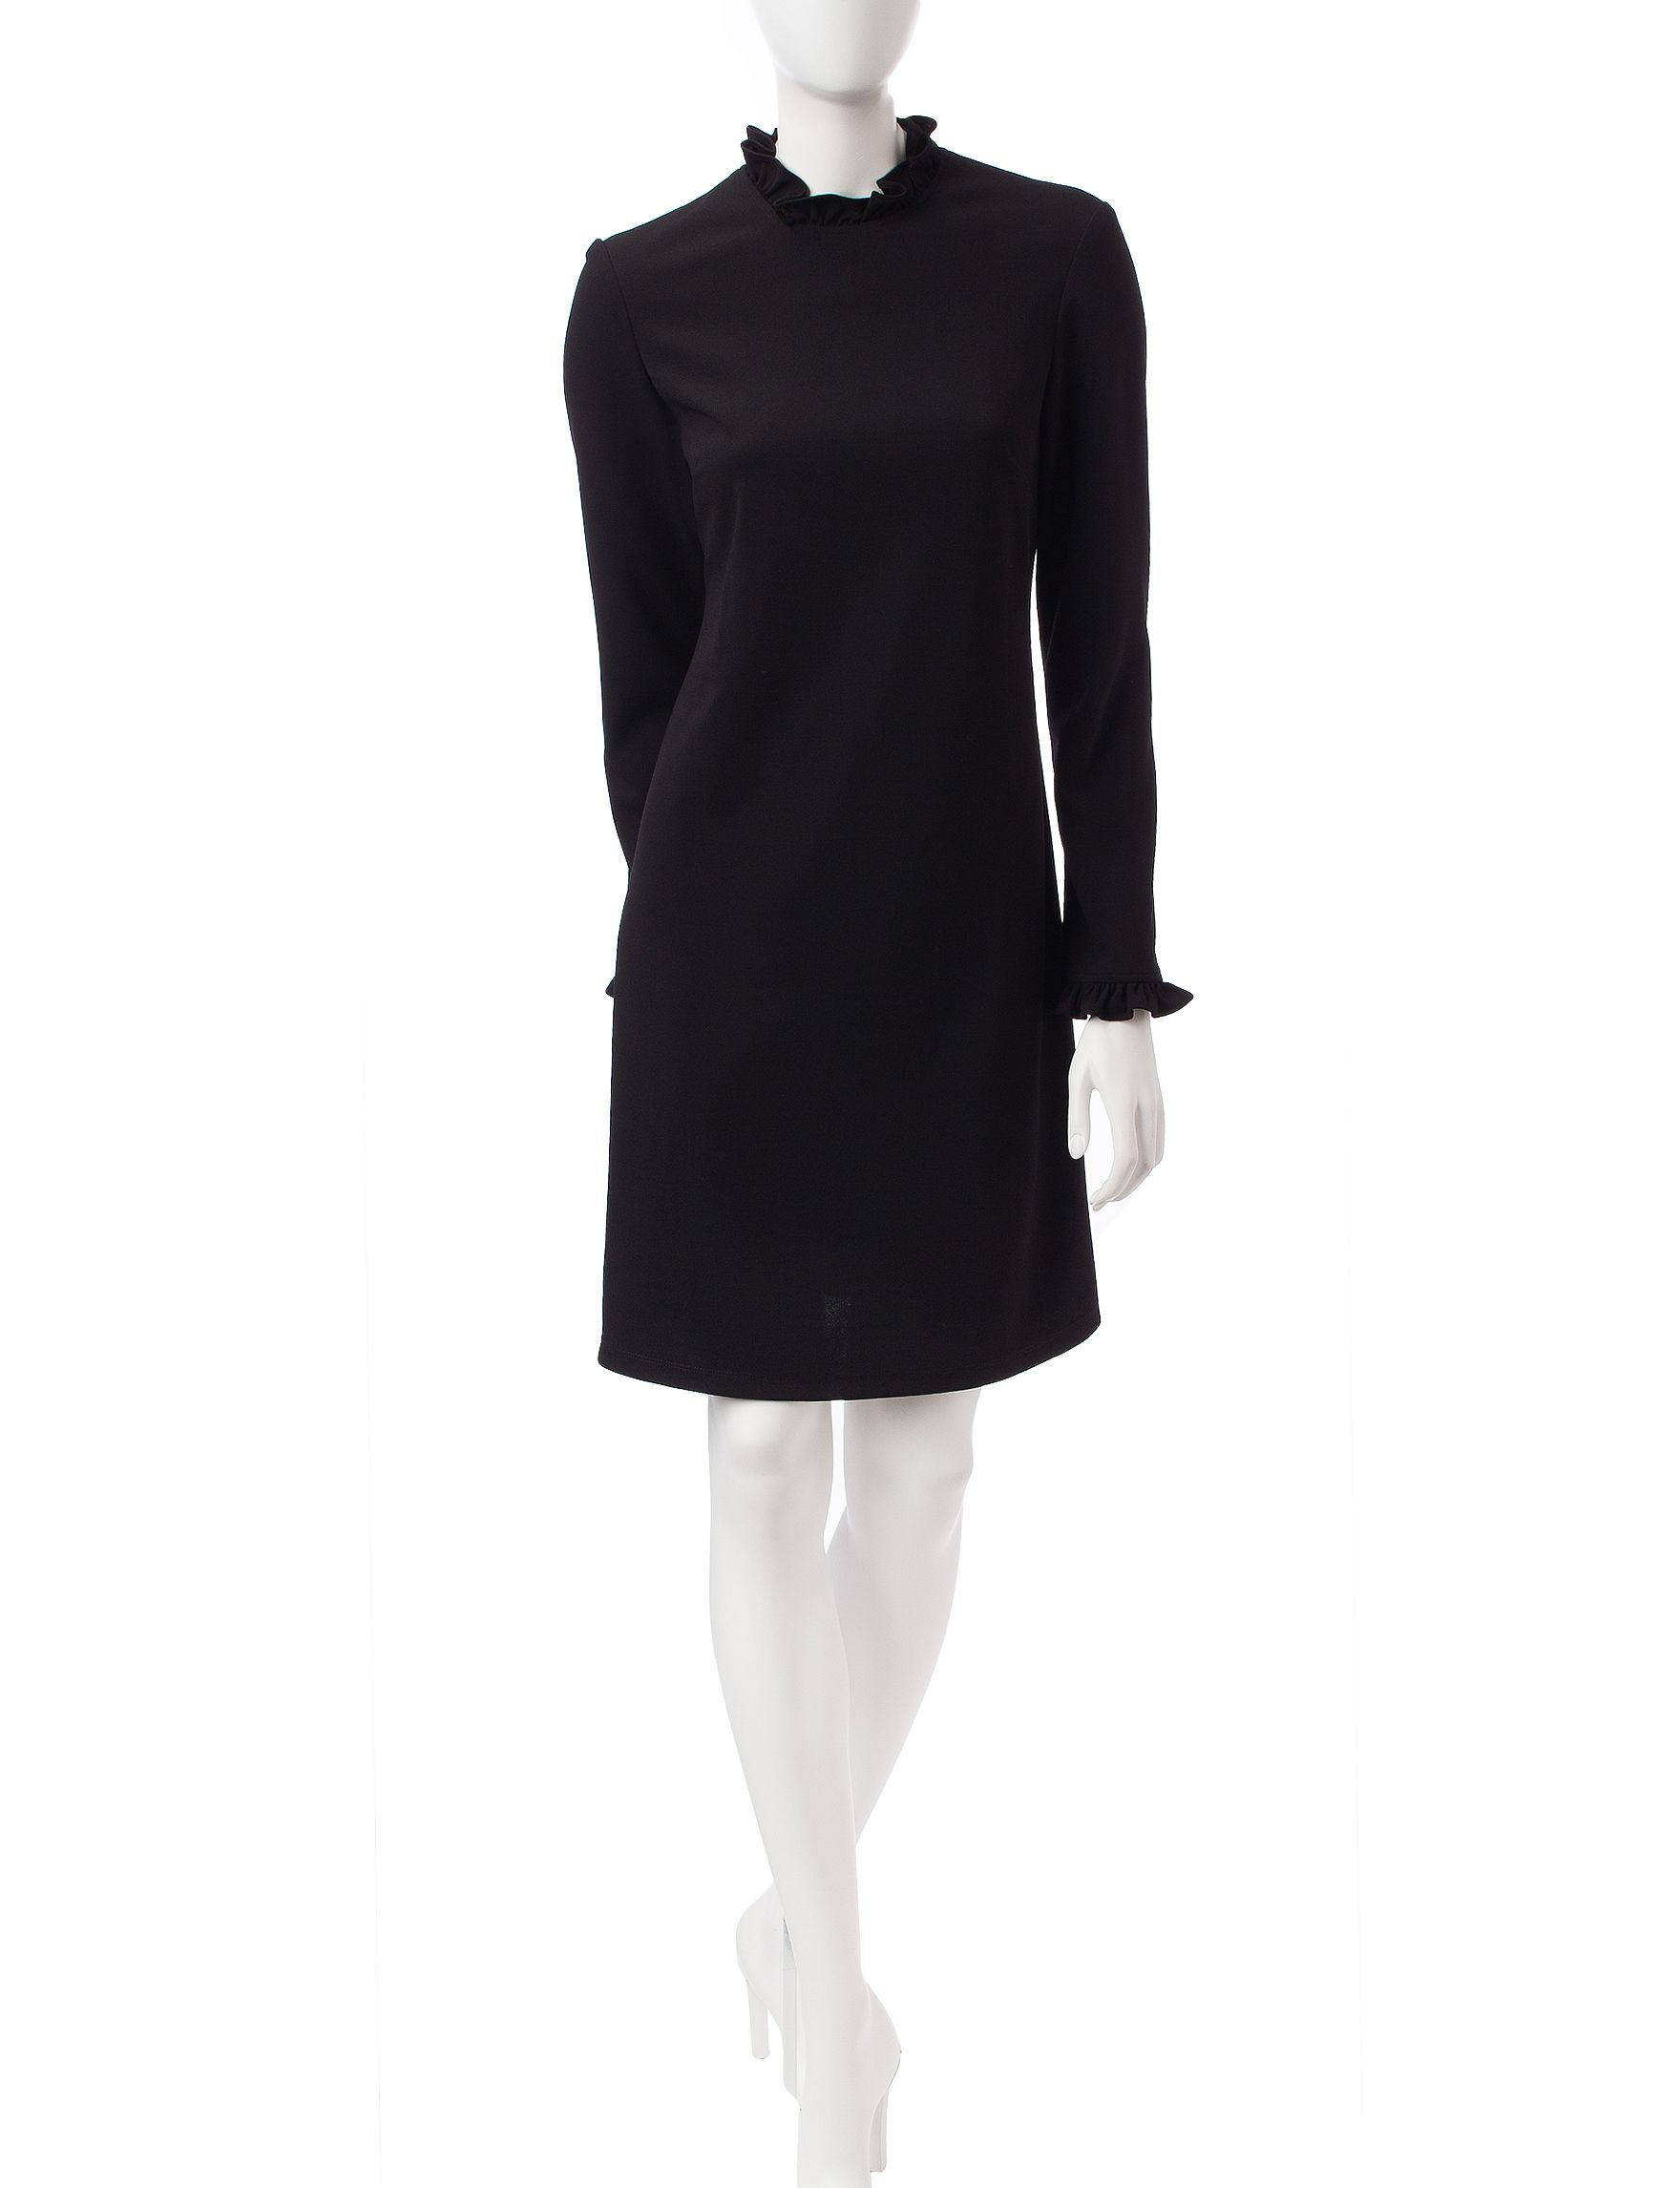 Ronni Nicole Black Everyday & Casual Shift Dresses